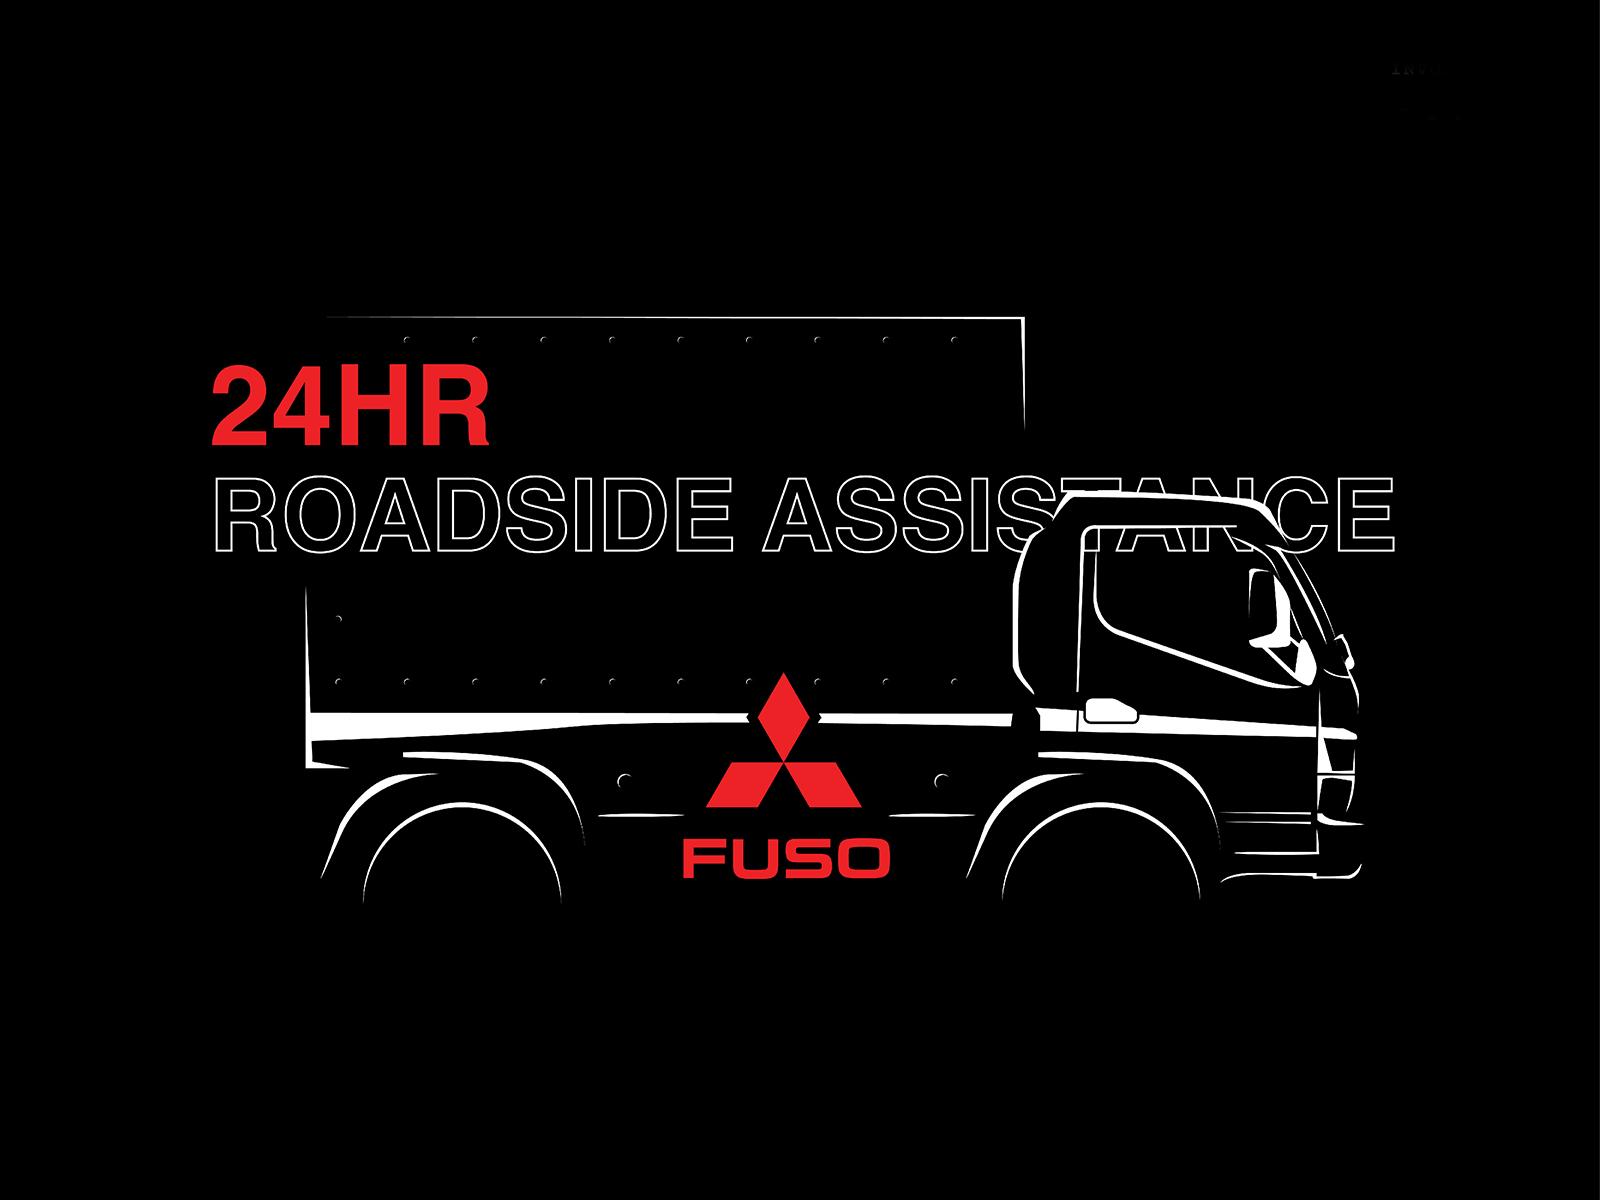 apaper_fuso_24_hour_24hr_roadside_assistance_masthead-01.jpg